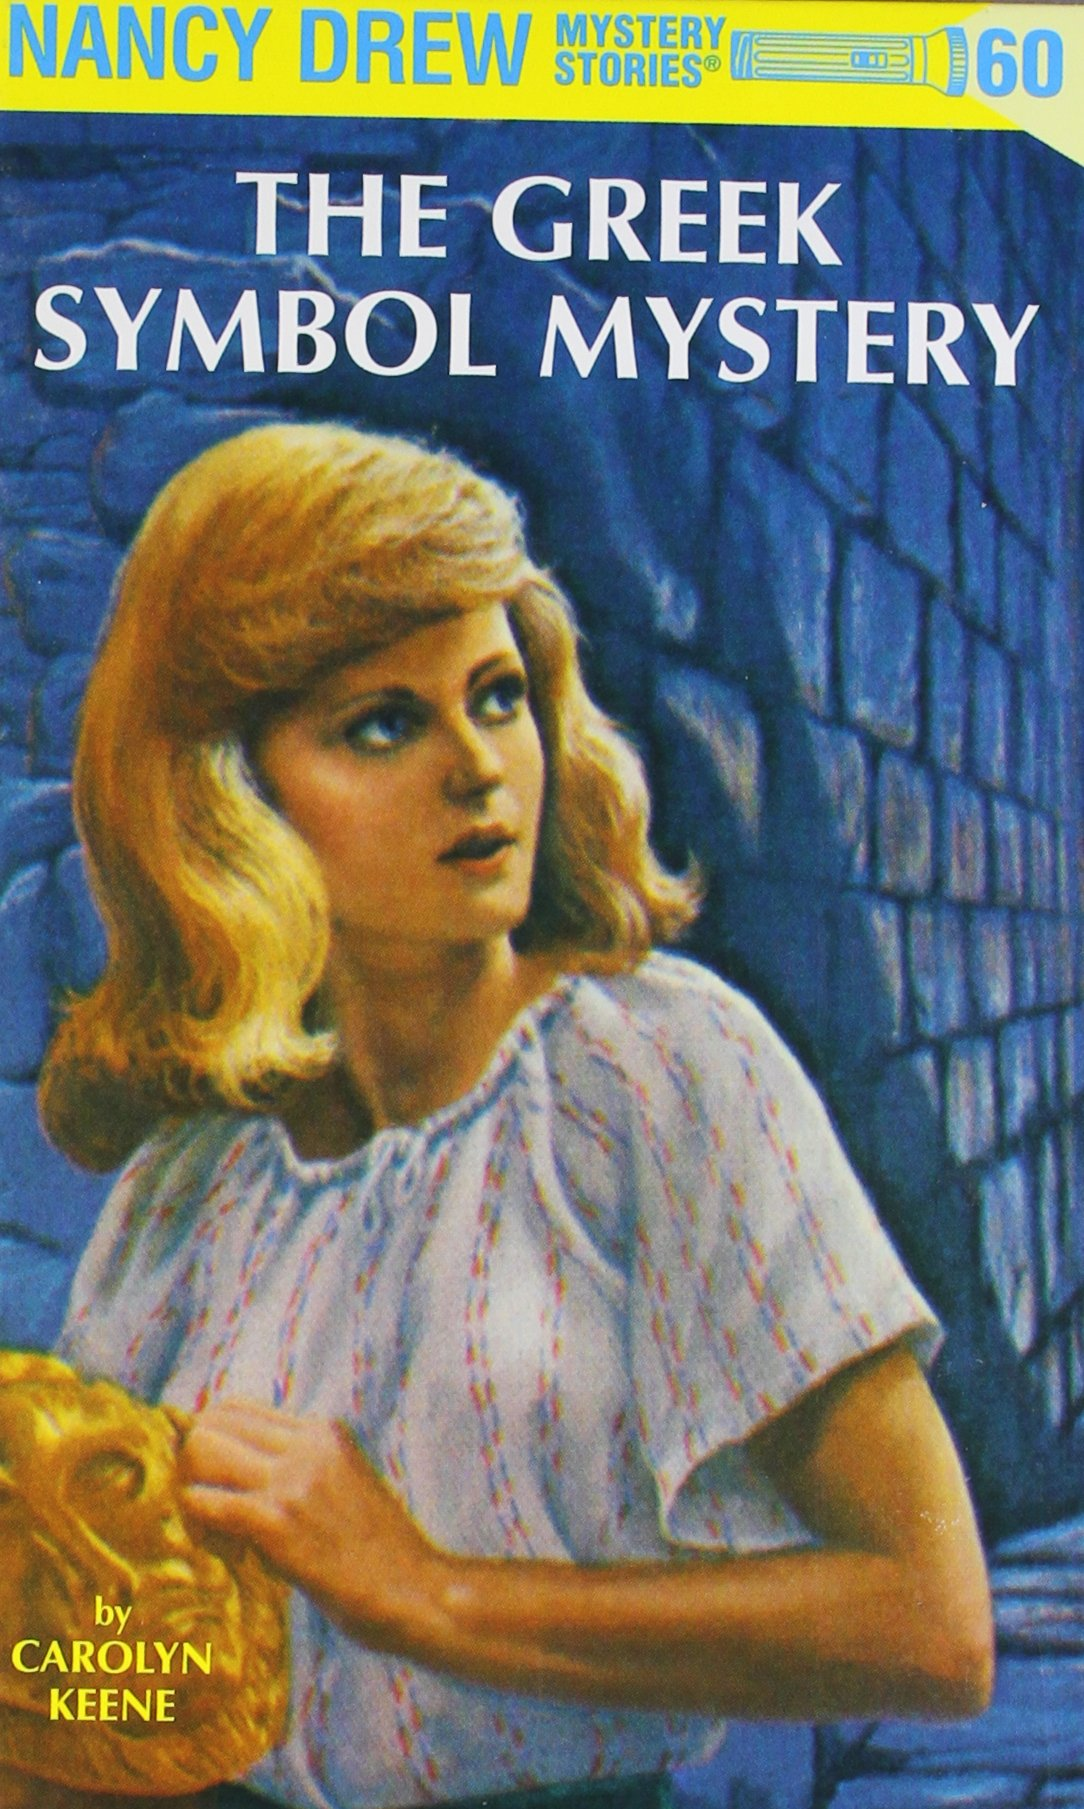 Nancy Drew 60: The Greek Symbol Mystery by Grosset & Dunlap